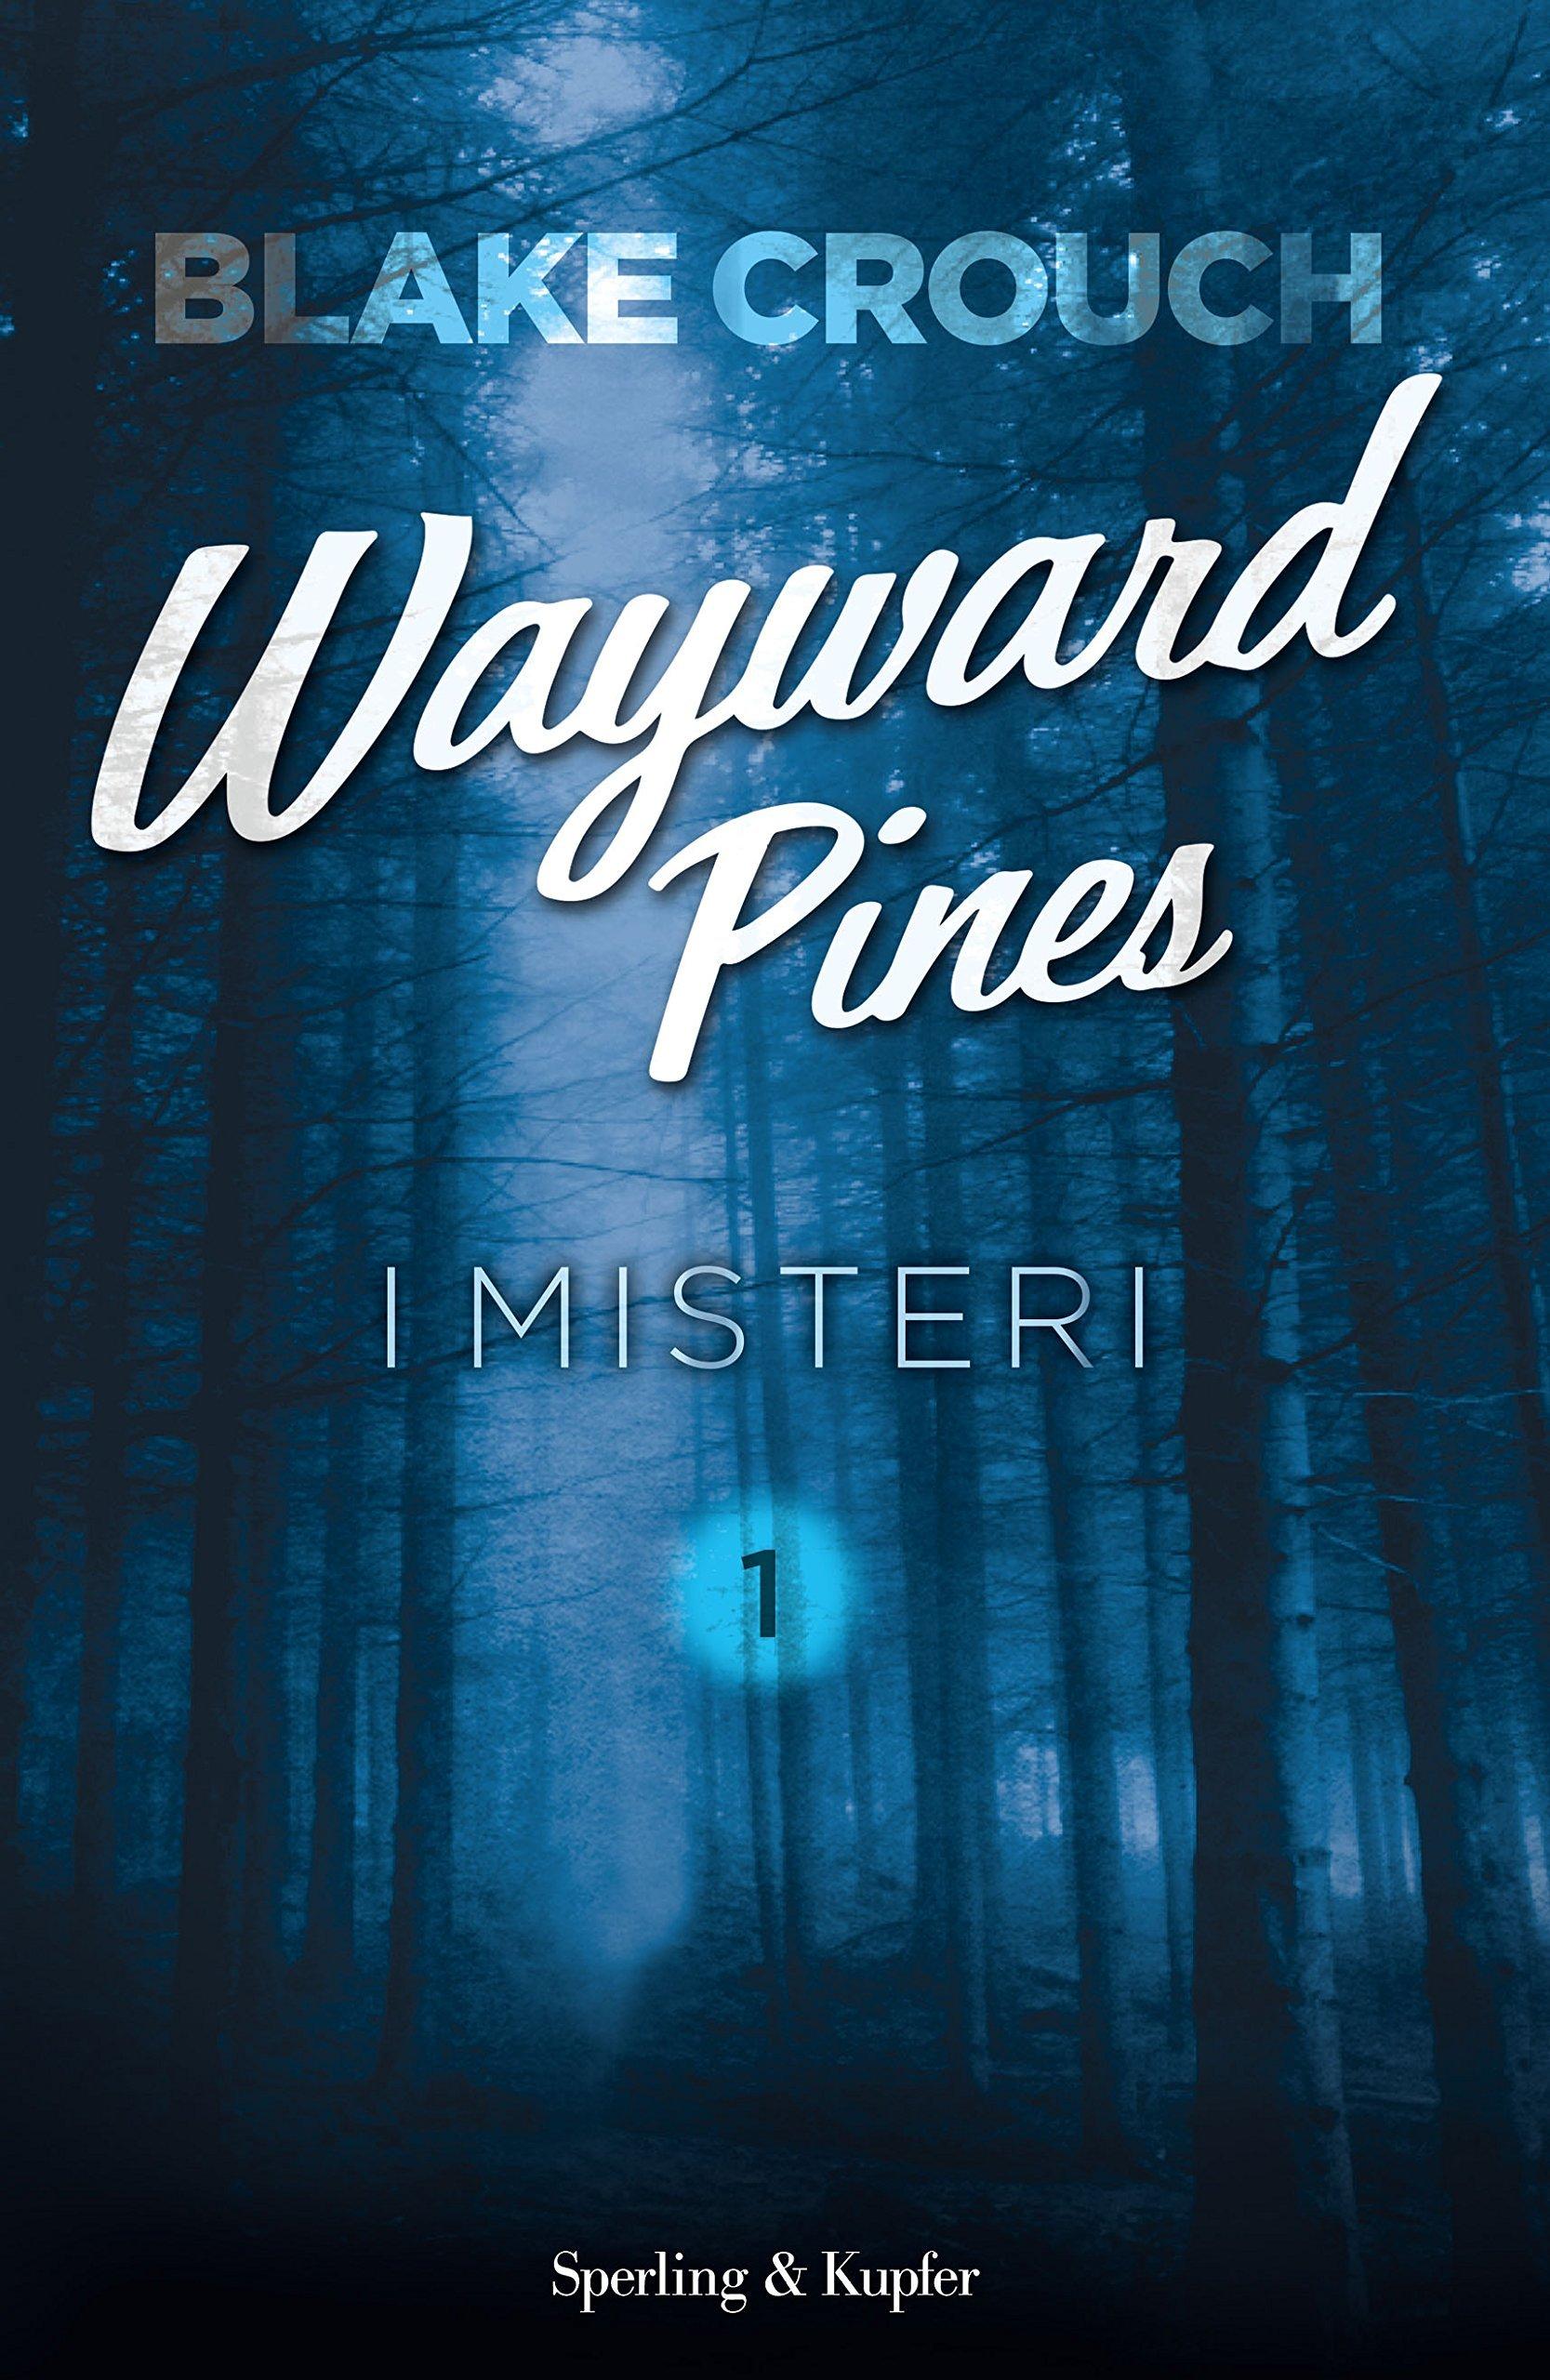 I misteri (Wayward Pines, #1)  by  Blake Crouch